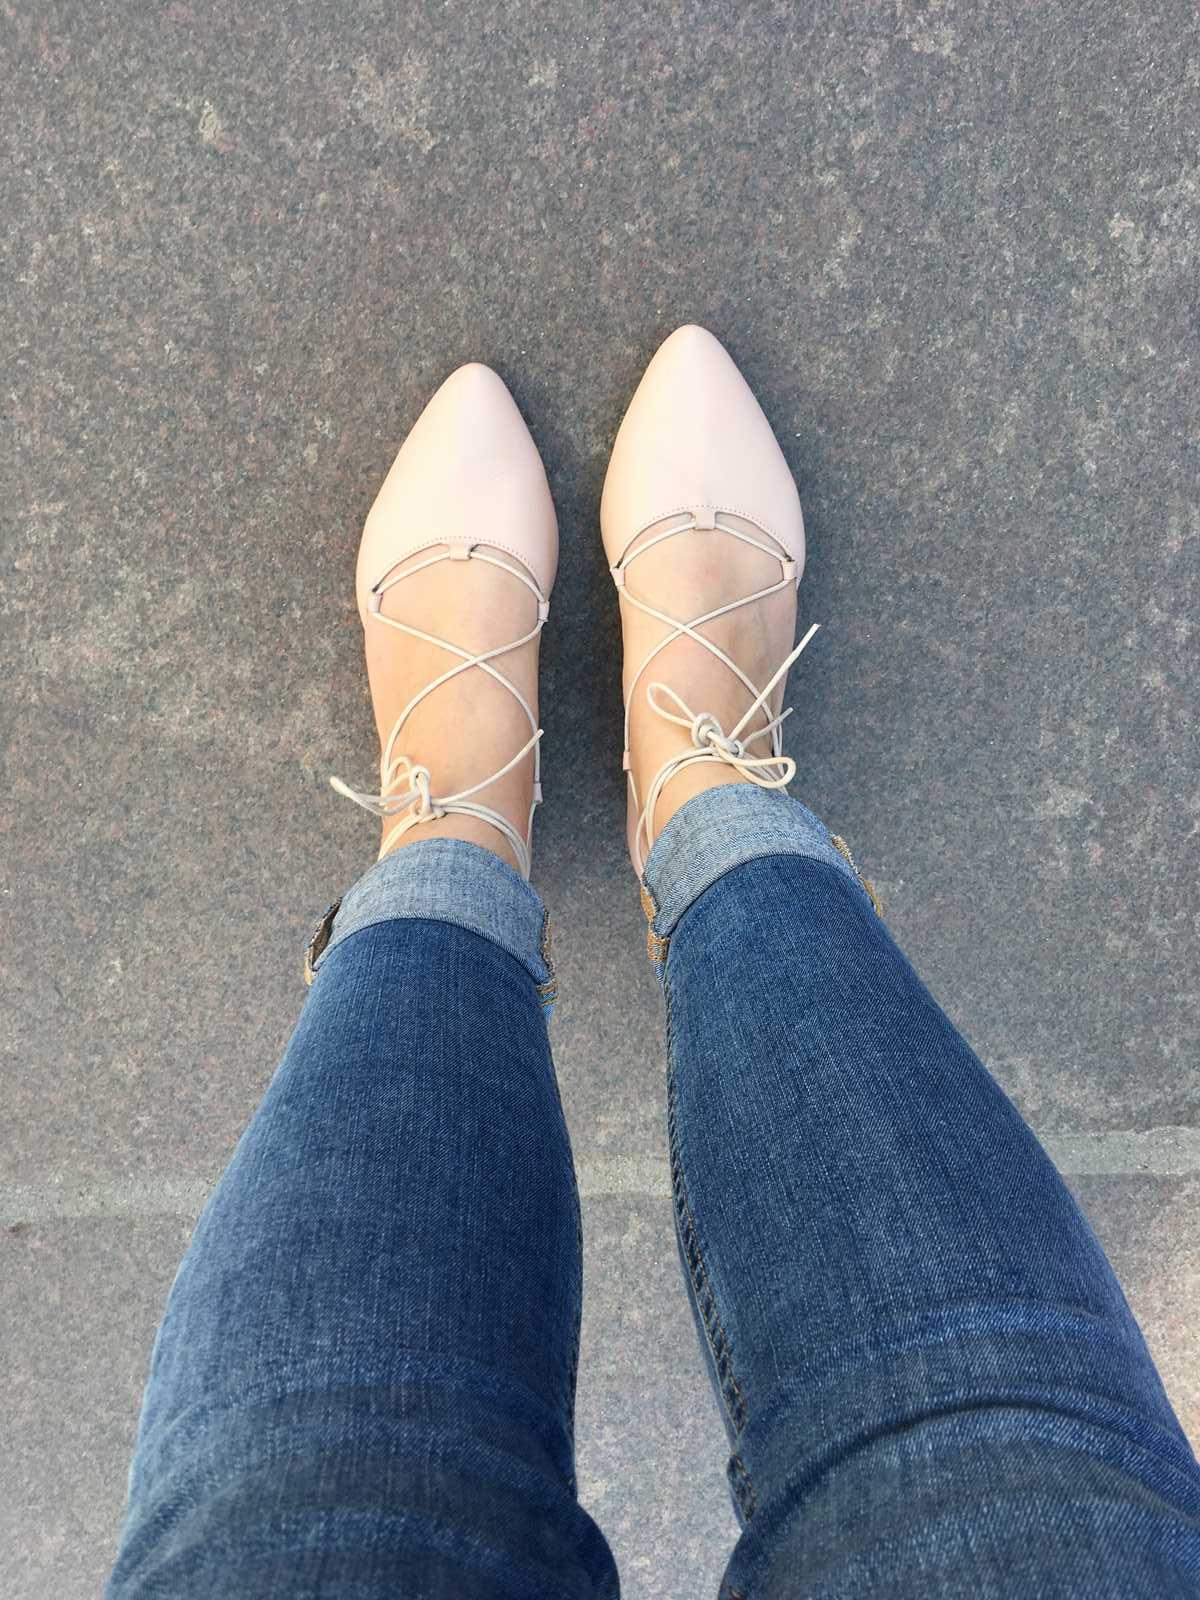 baleriny stopy